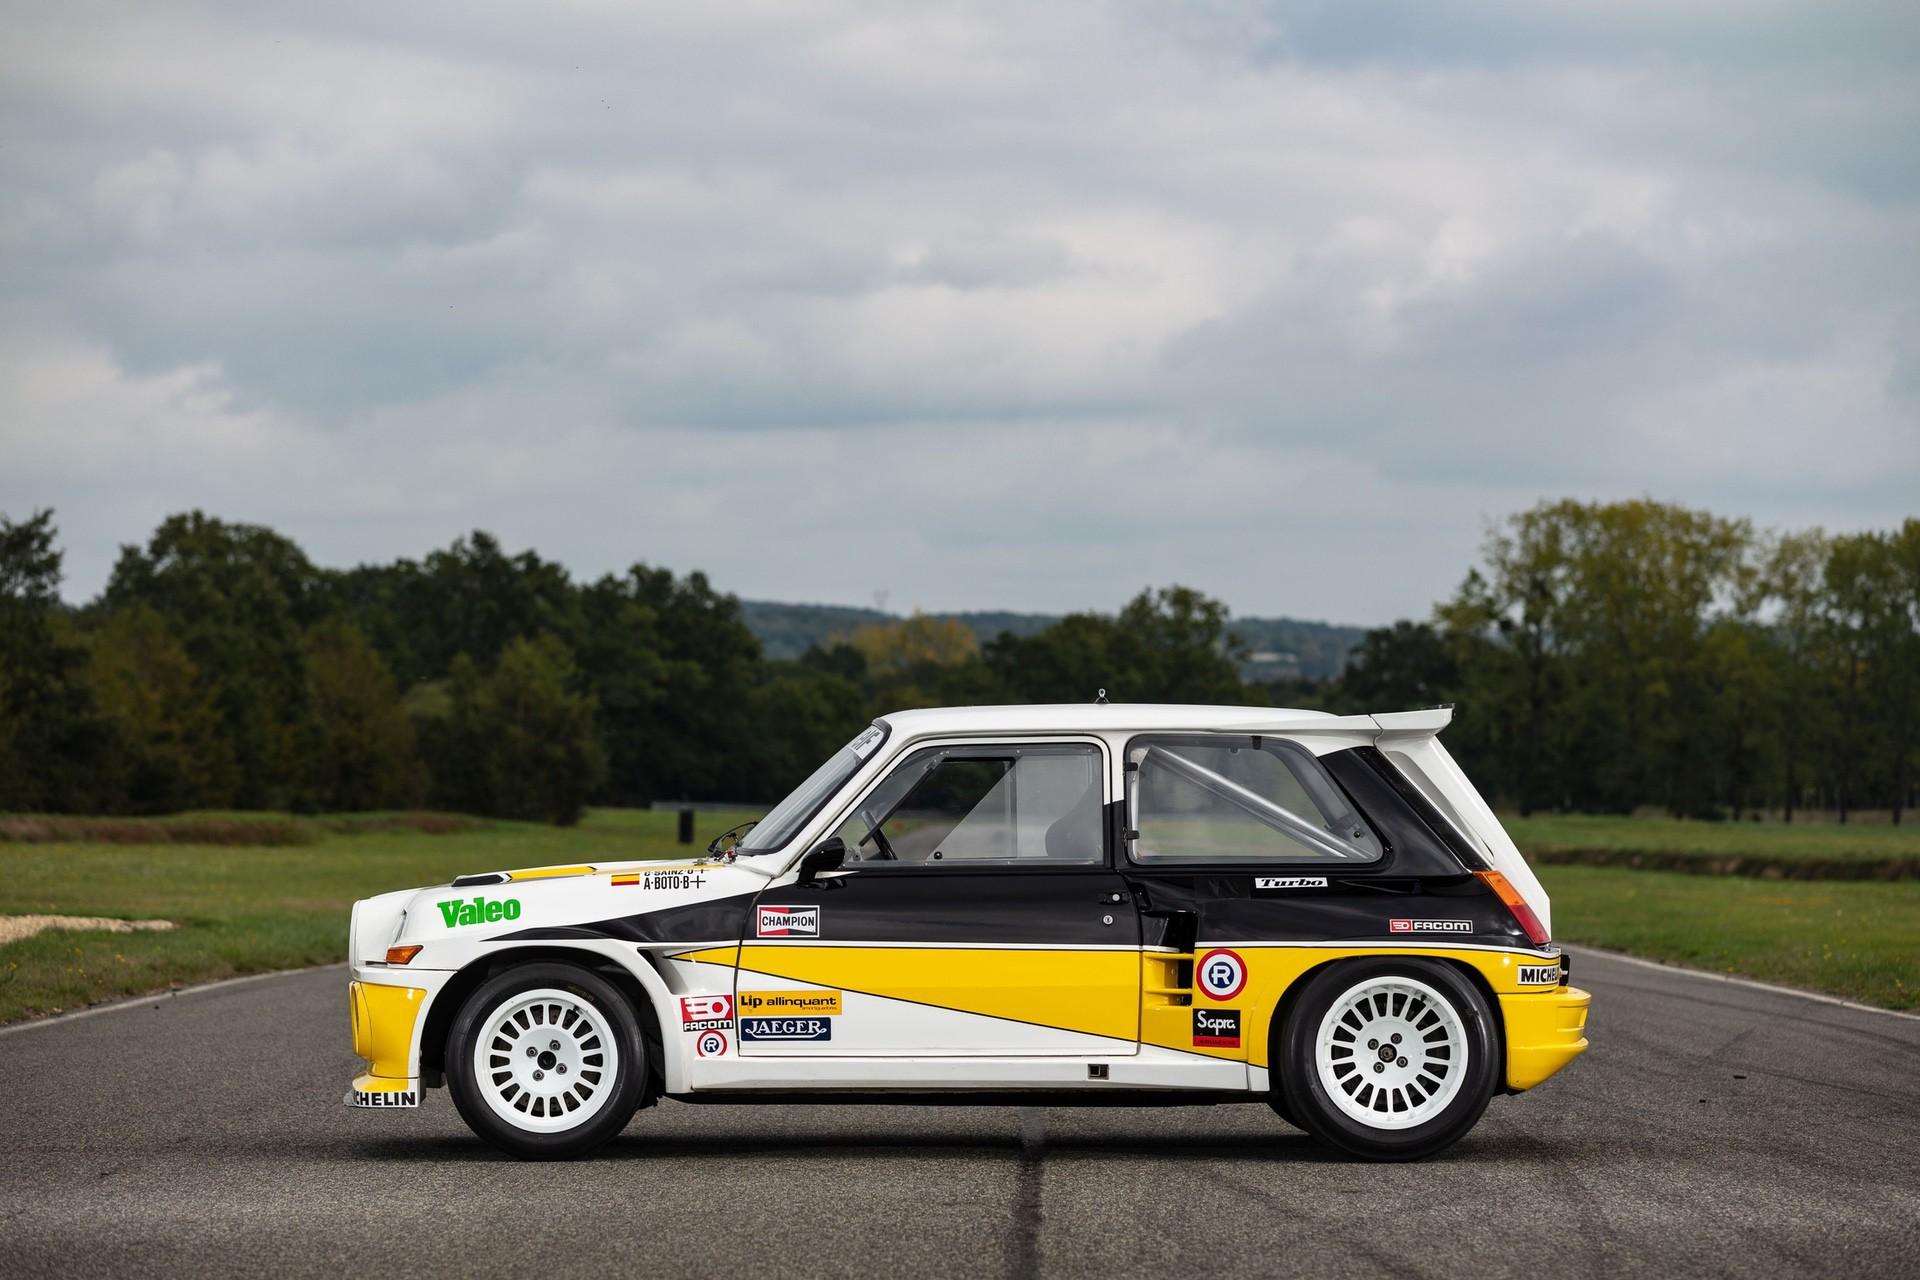 Renault_R5_Maxi_Turbo_ex-Carlos_Sainz-0045